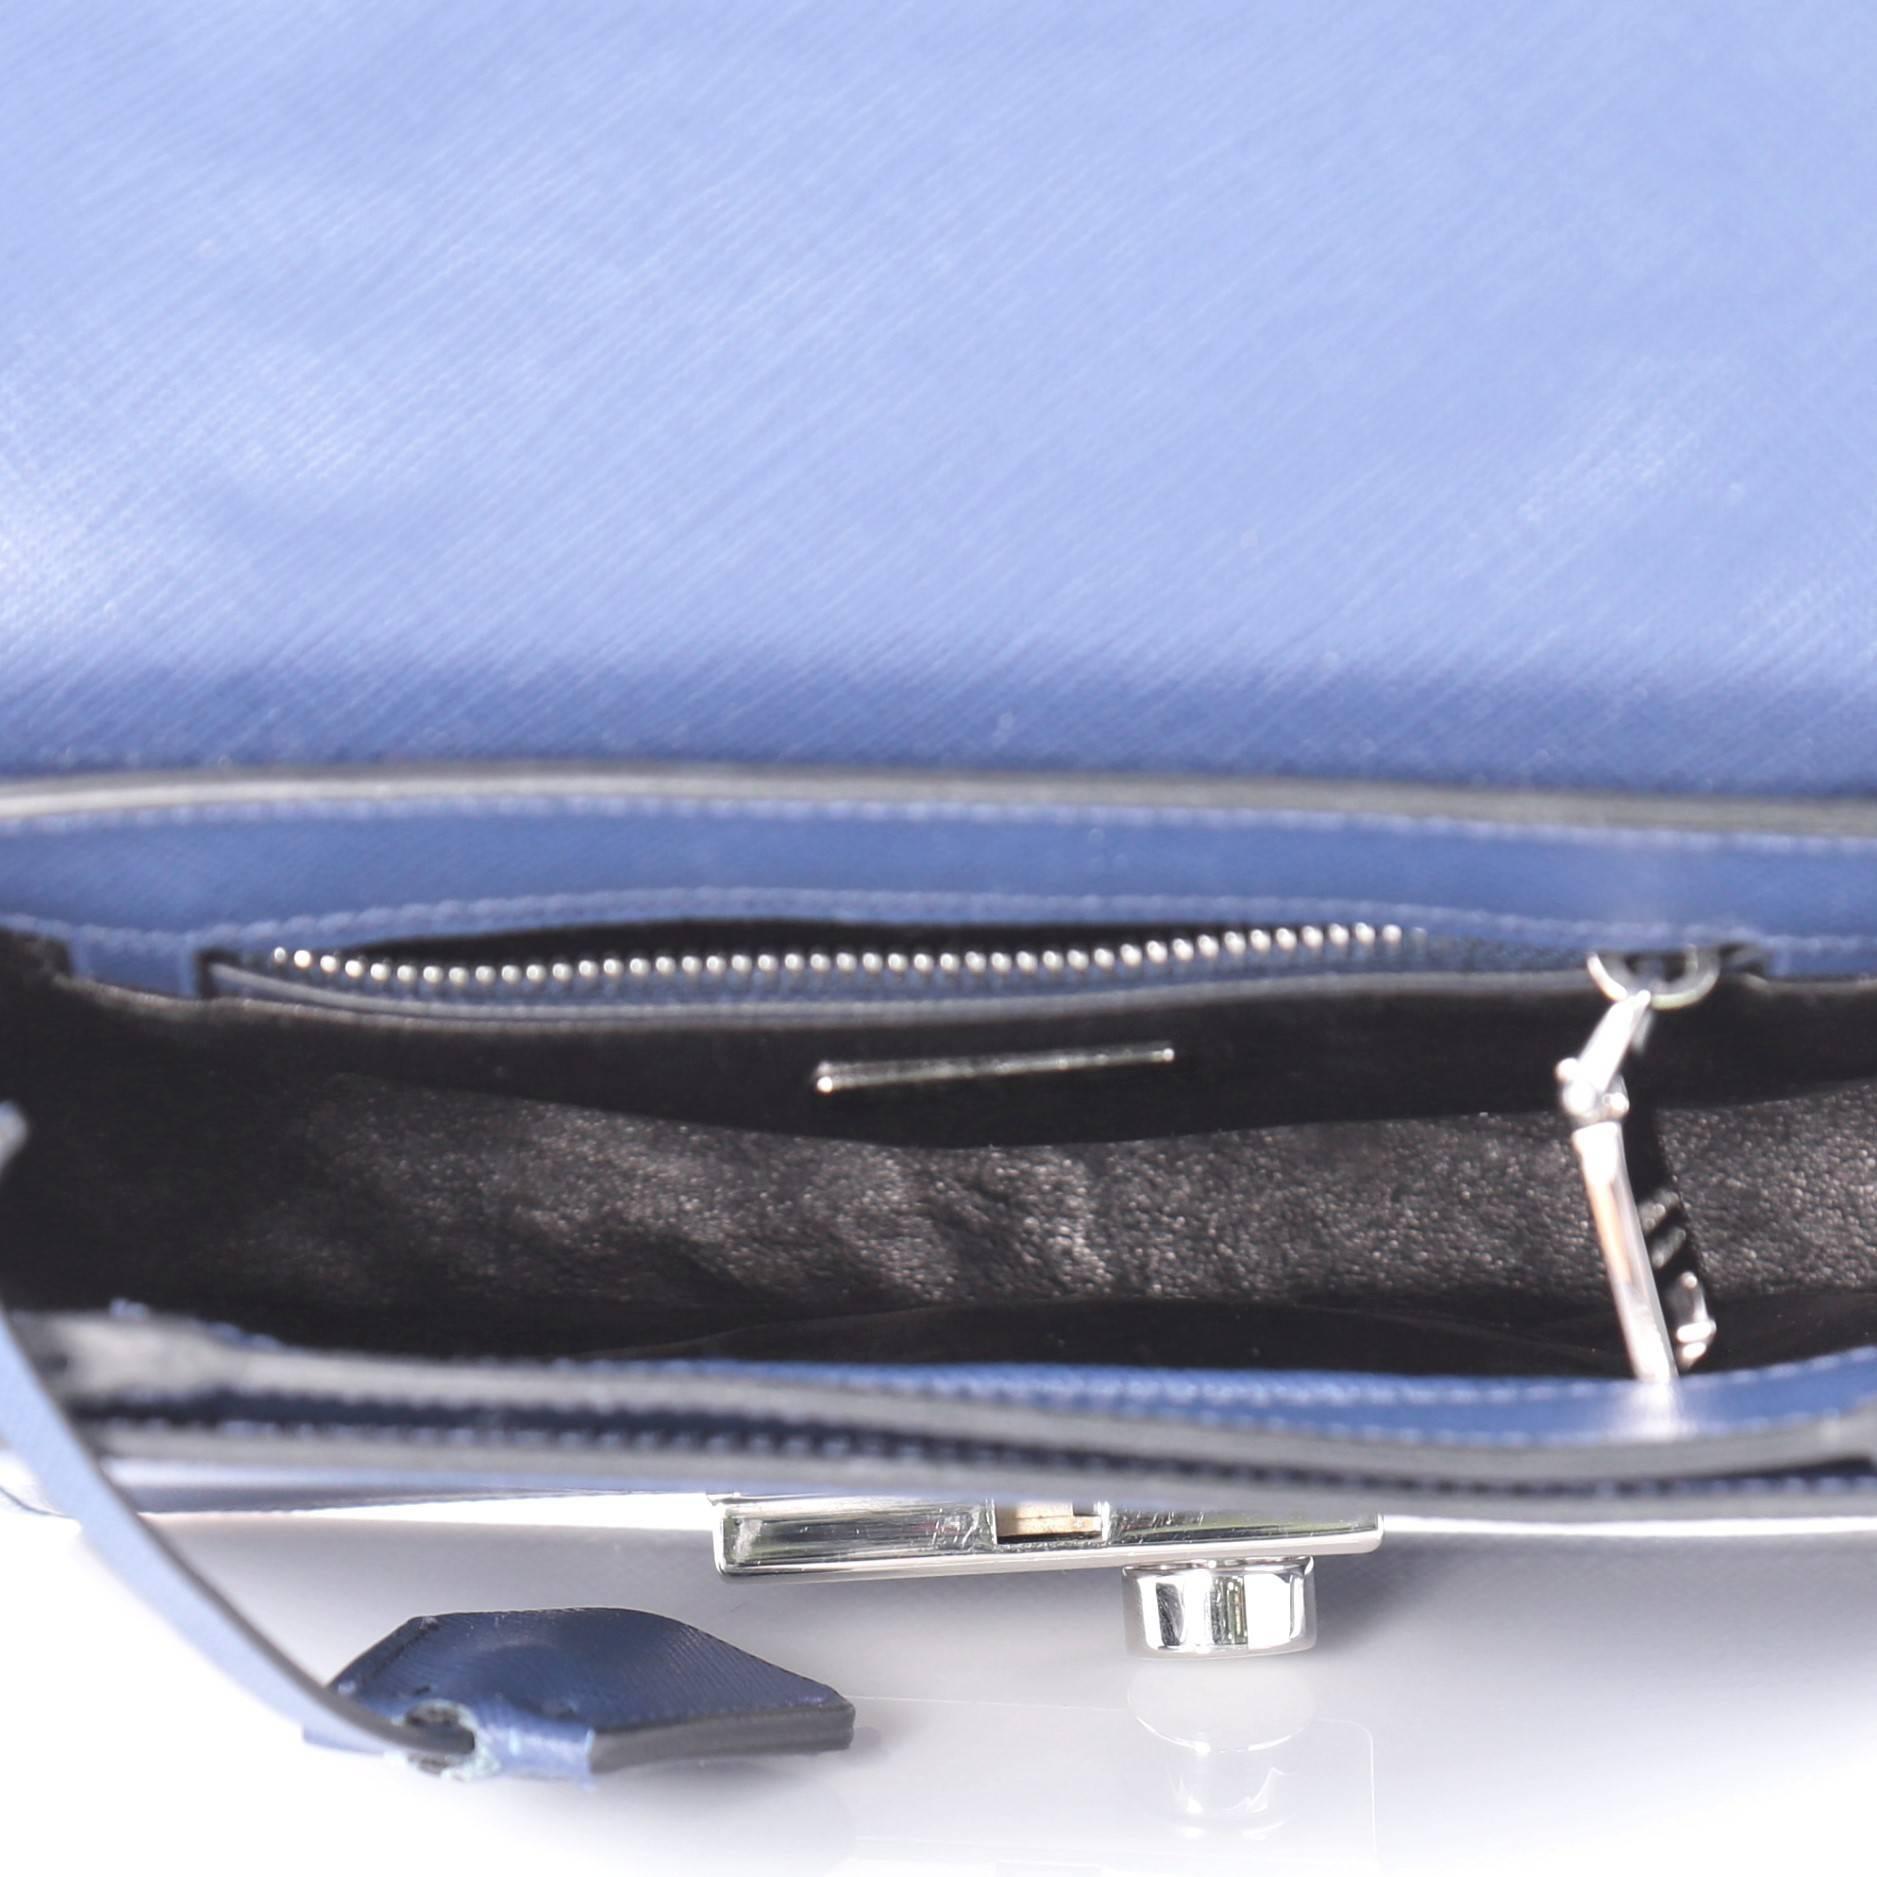 032f4d296359 Prada Lux Sound Crossbody Bag Saffiano Leather Small at 1stdibs